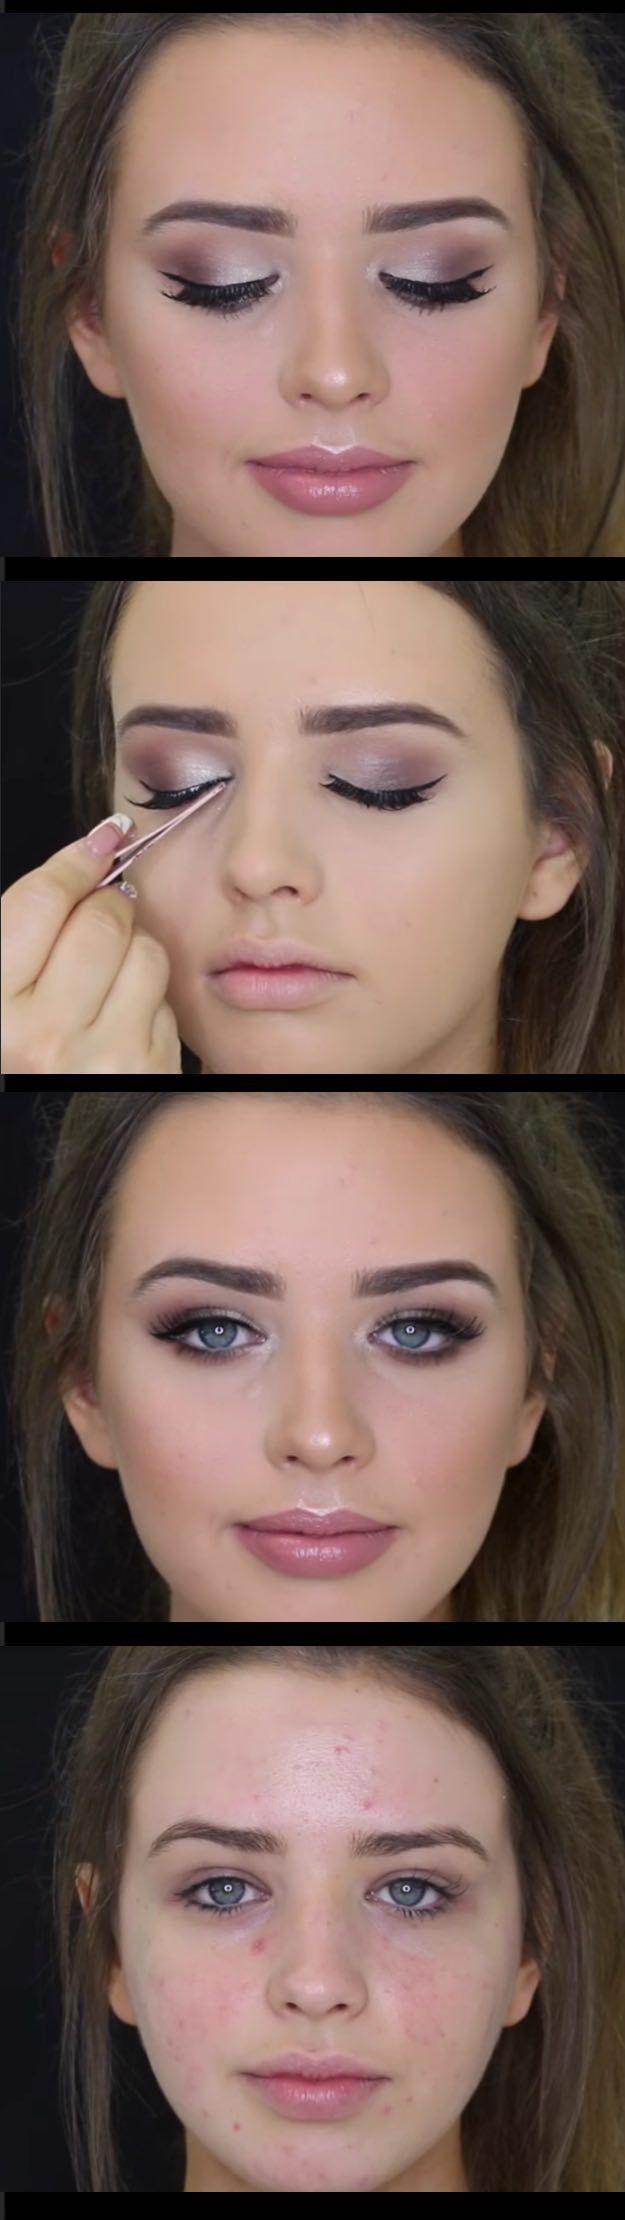 Wedding Makeup Ideas for Brides - Bridal Inspired Makeup Tutorial - Romantic mak...